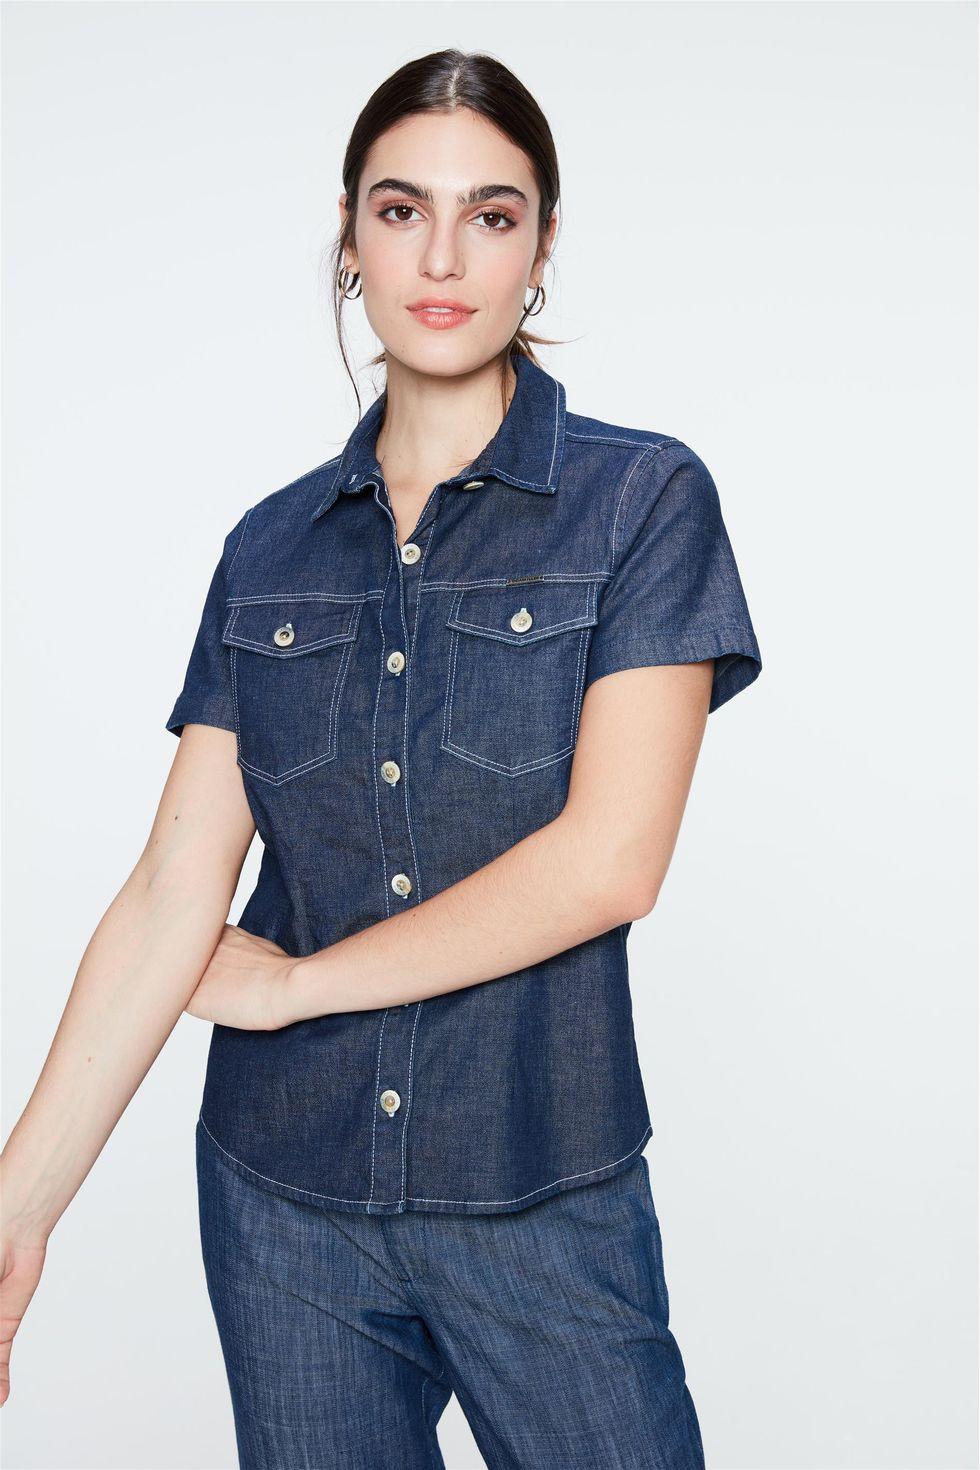 Camisa-Jeans-Azul-Escuro-de-Manga-Curta-Frente--